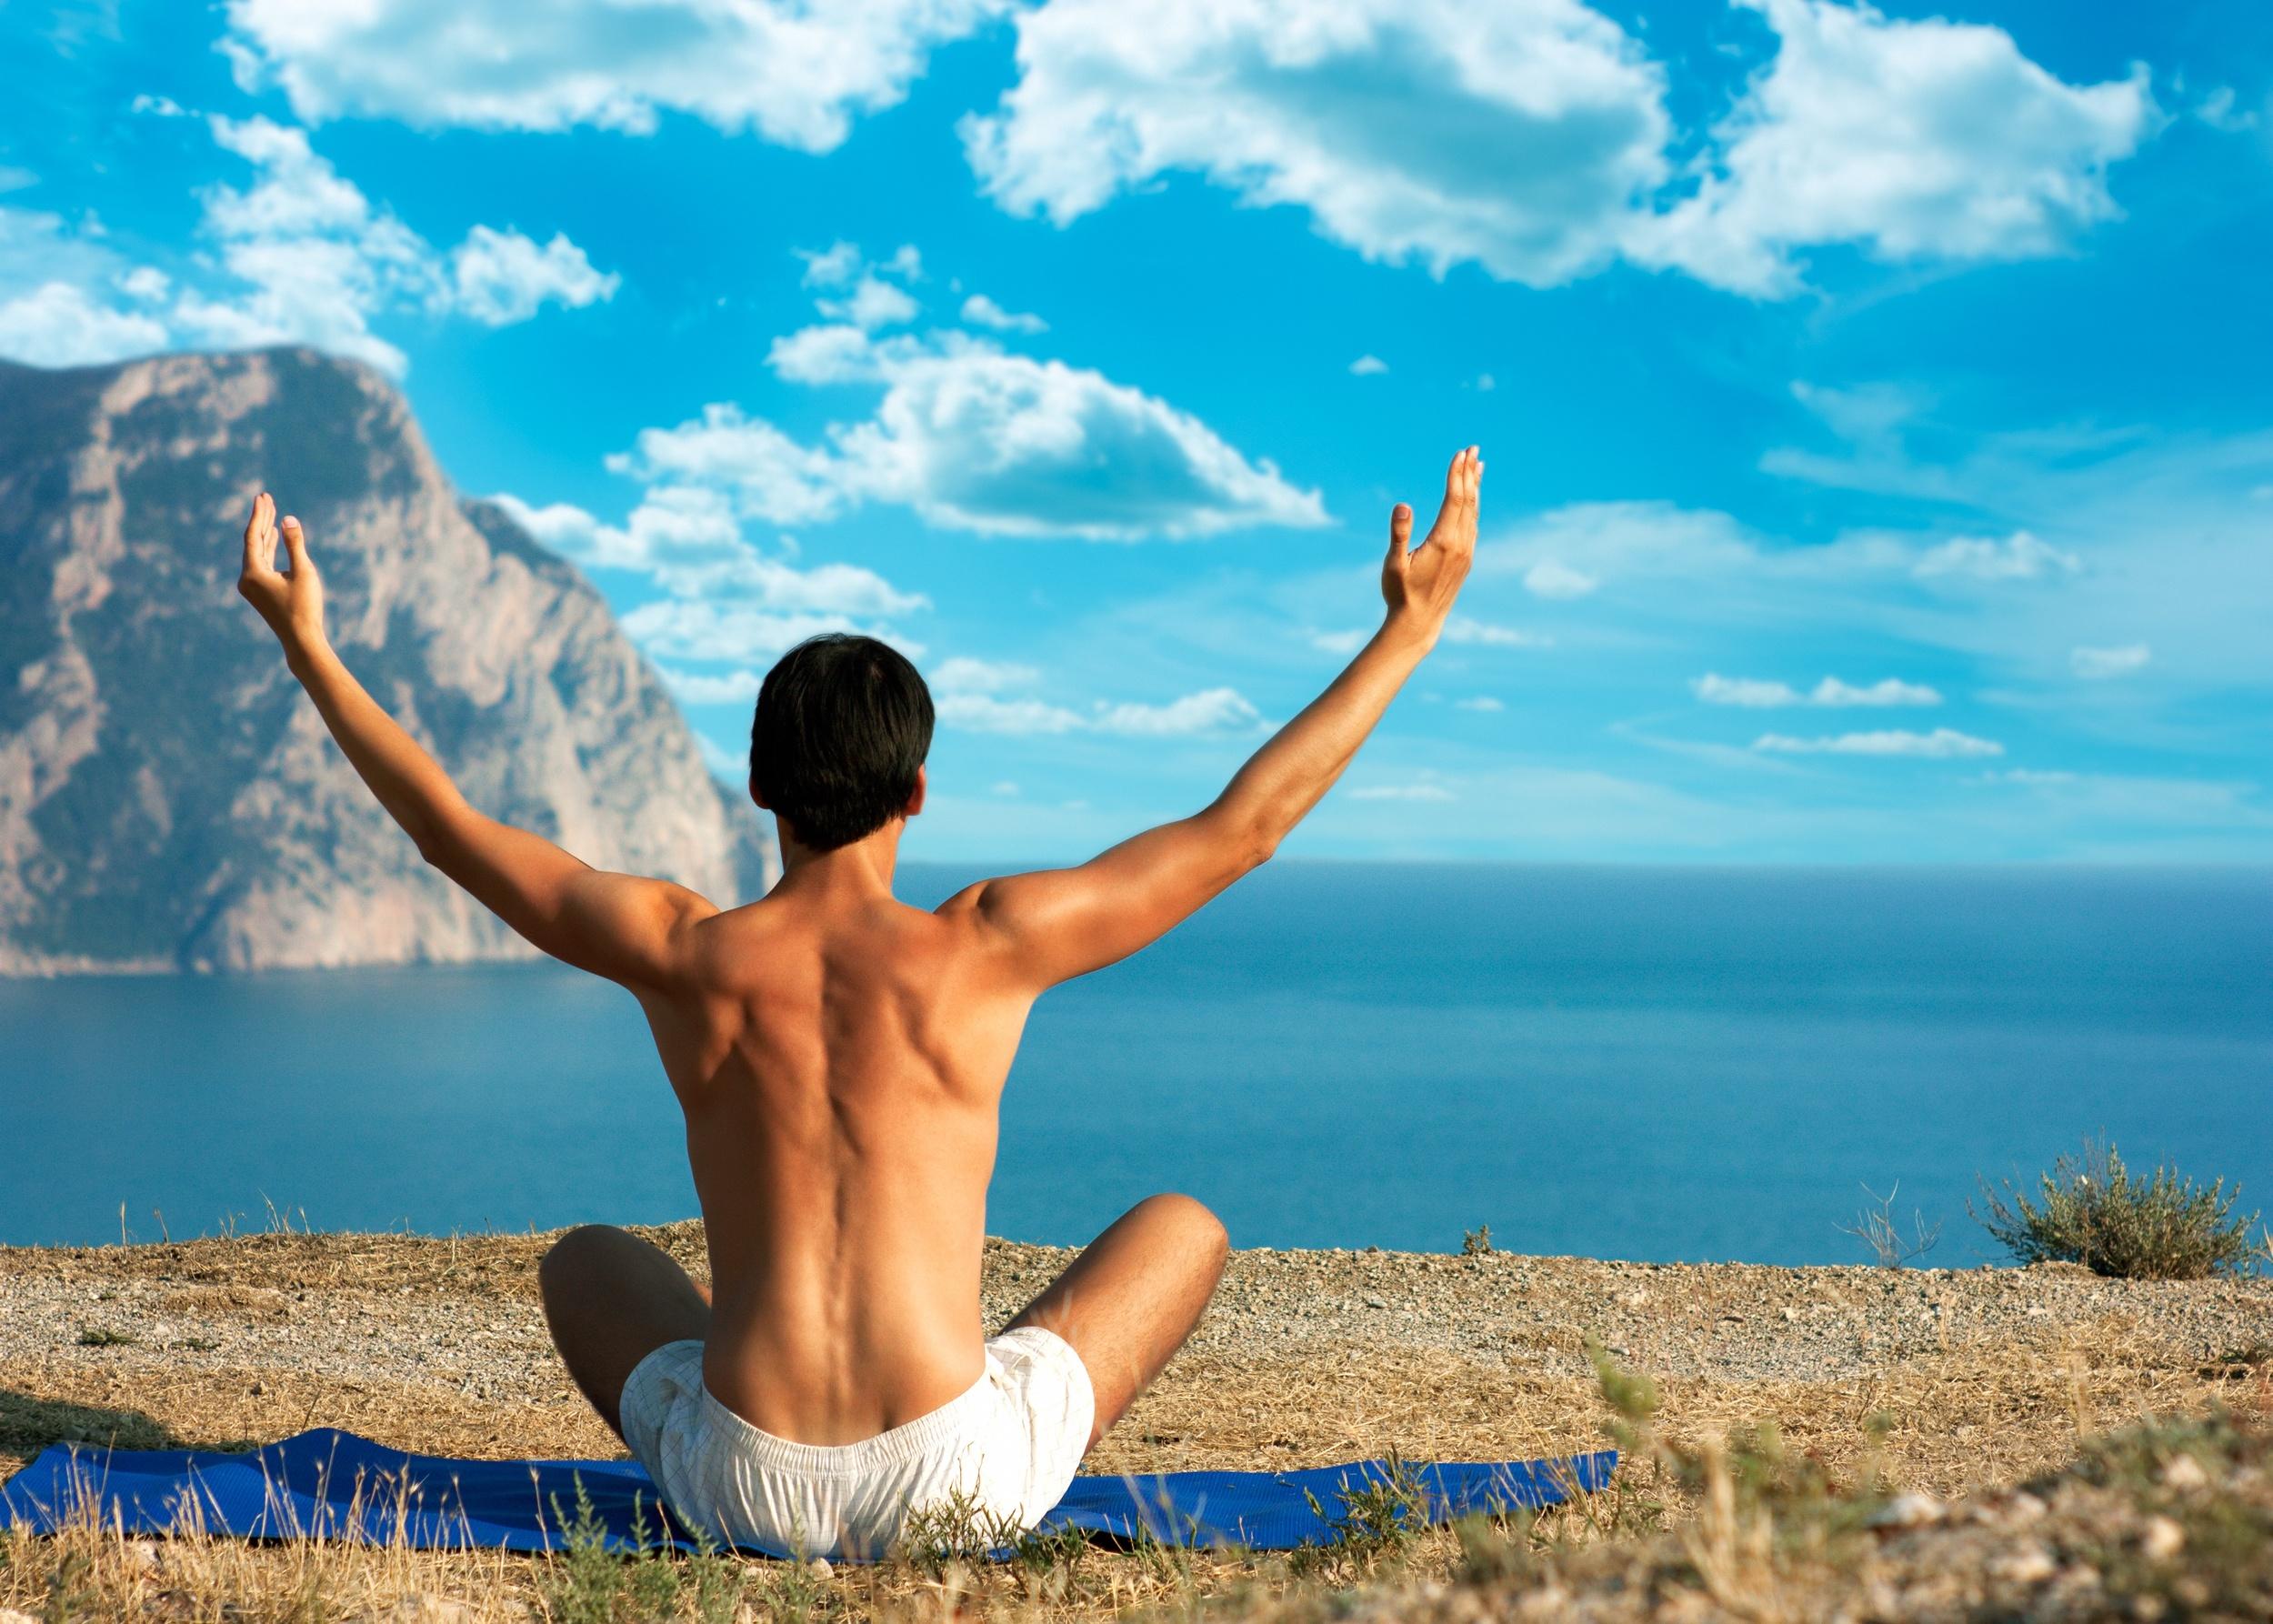 About Virtual Yoga